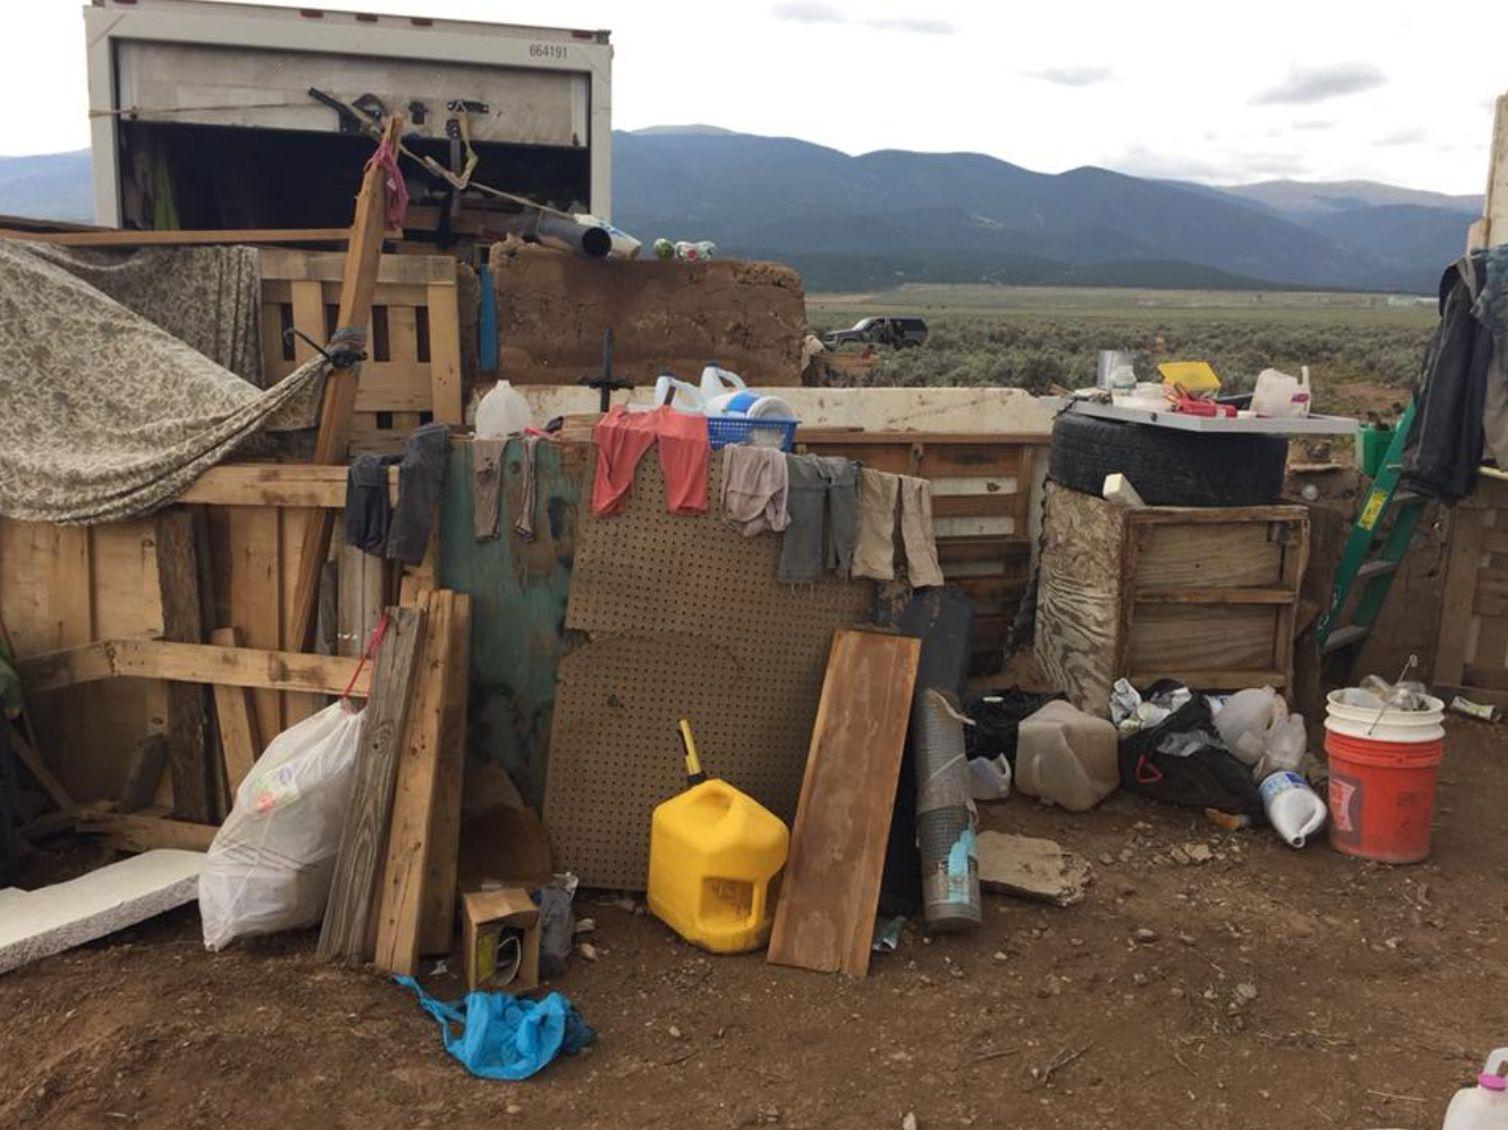 11 children found in squalid compound near New Mexico/Colorado state line